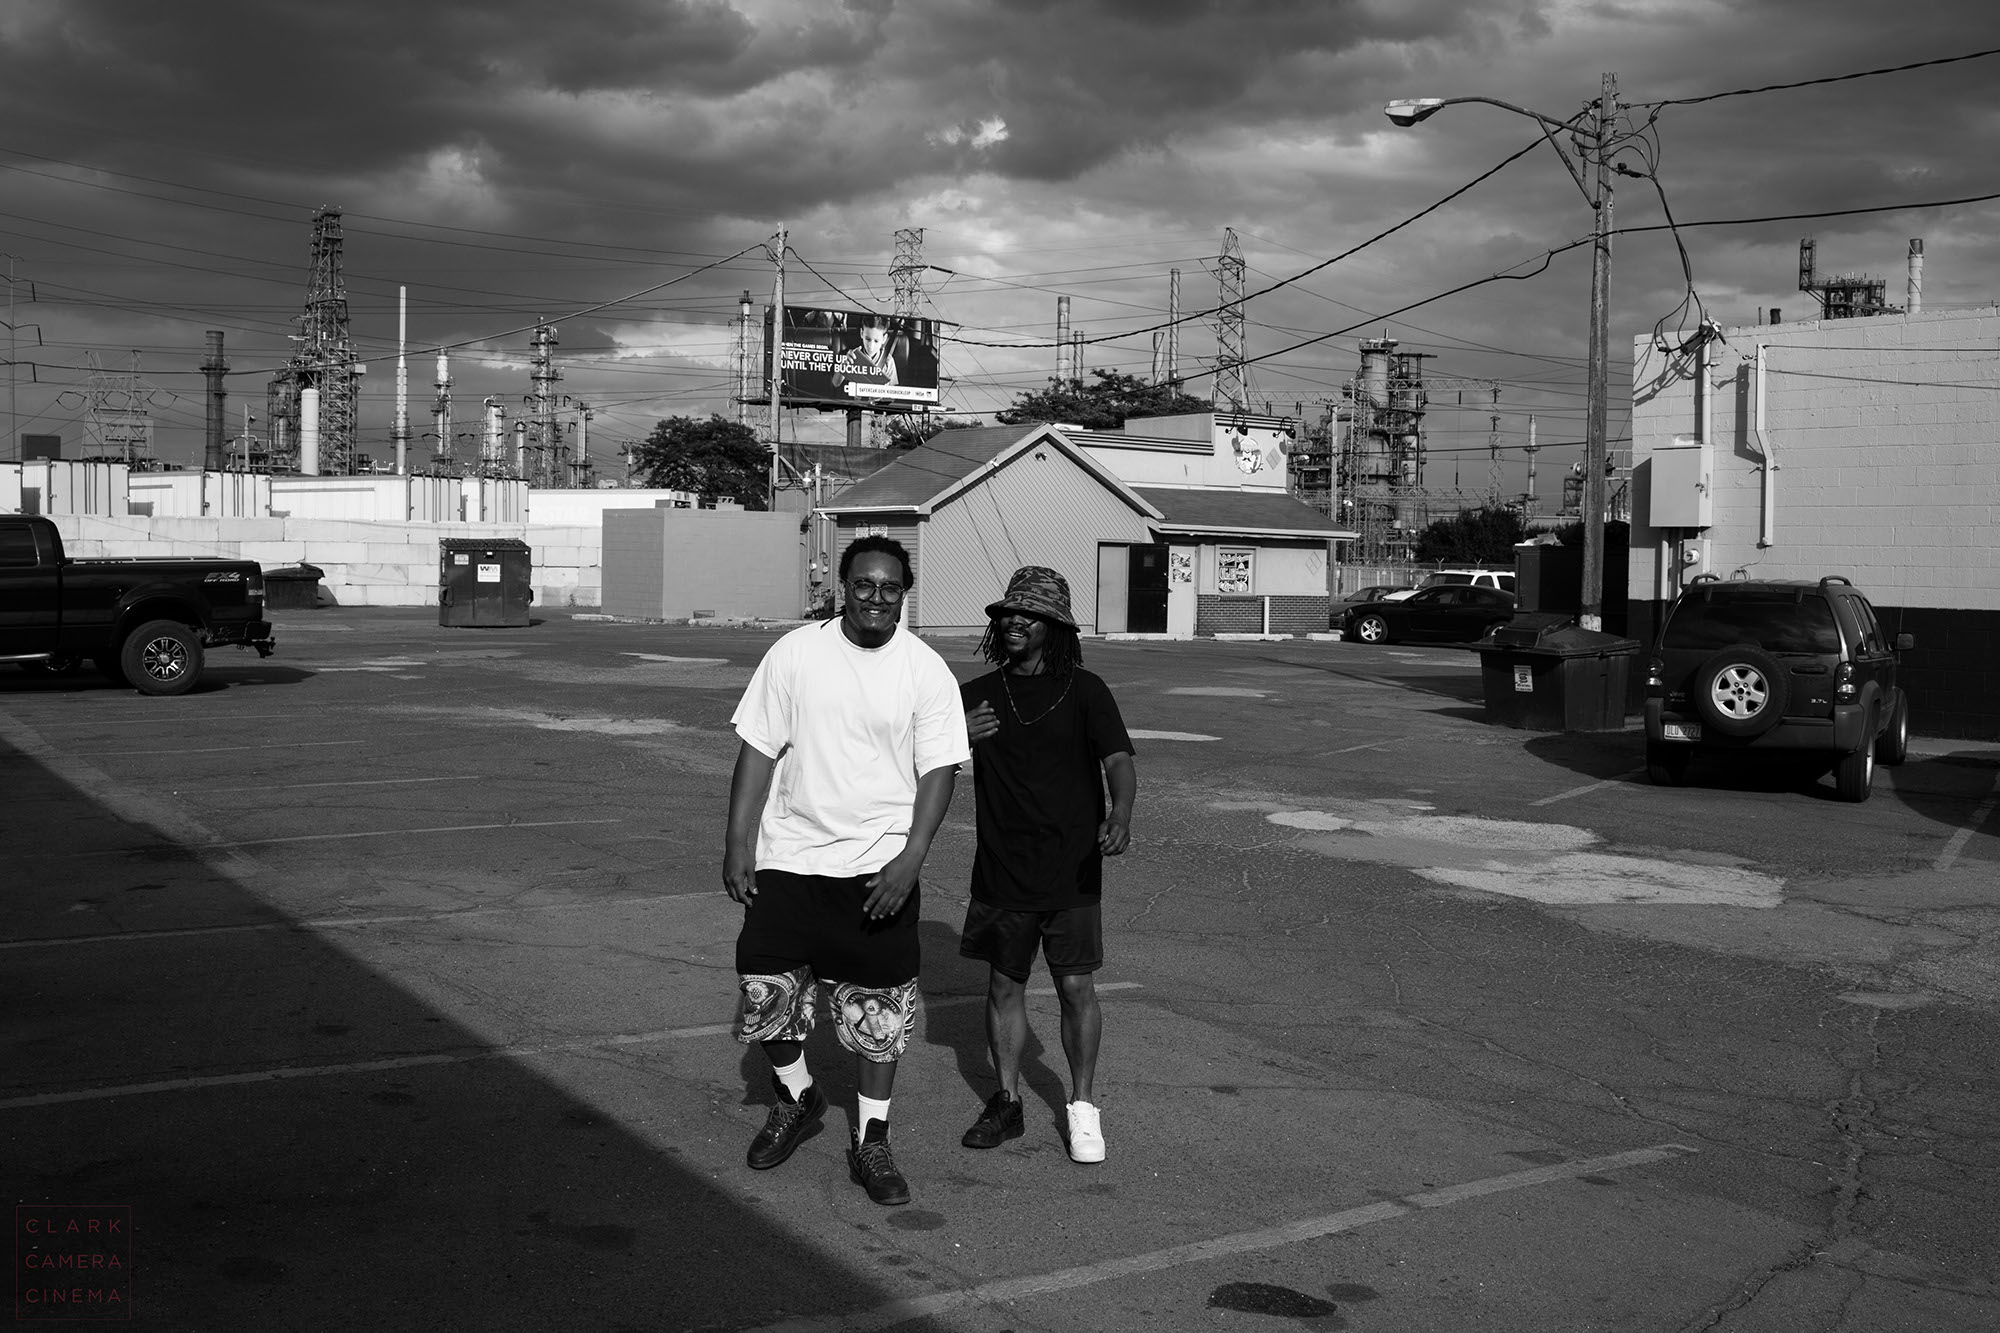 The Neighborhood 2016 Photo by Zachary A. Clark. clarkcameracinema@gmail.com-10.jpg